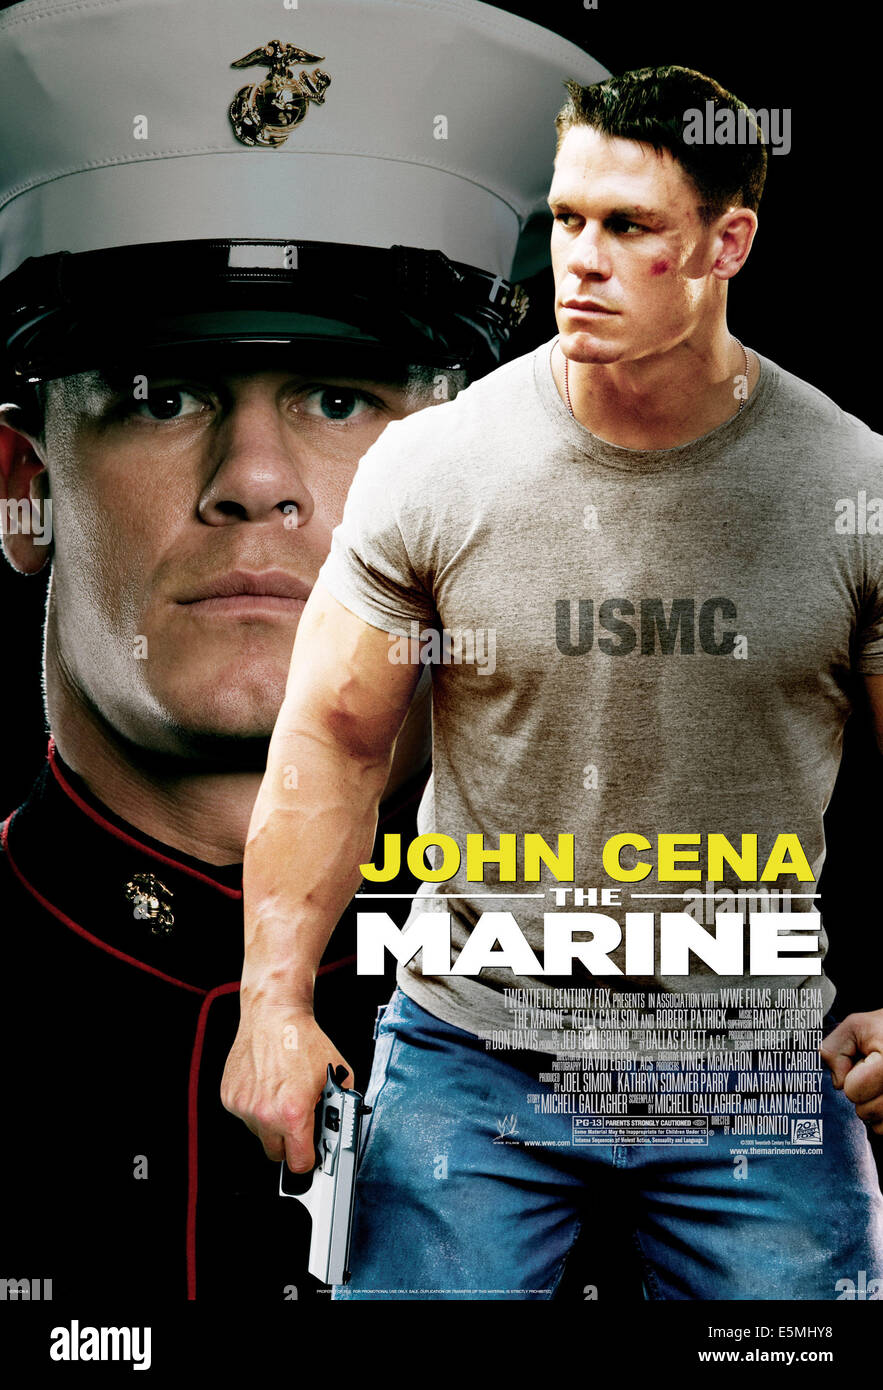 THE MARINE, John Cena, 2006, TM & Copyright (c) 20th ...